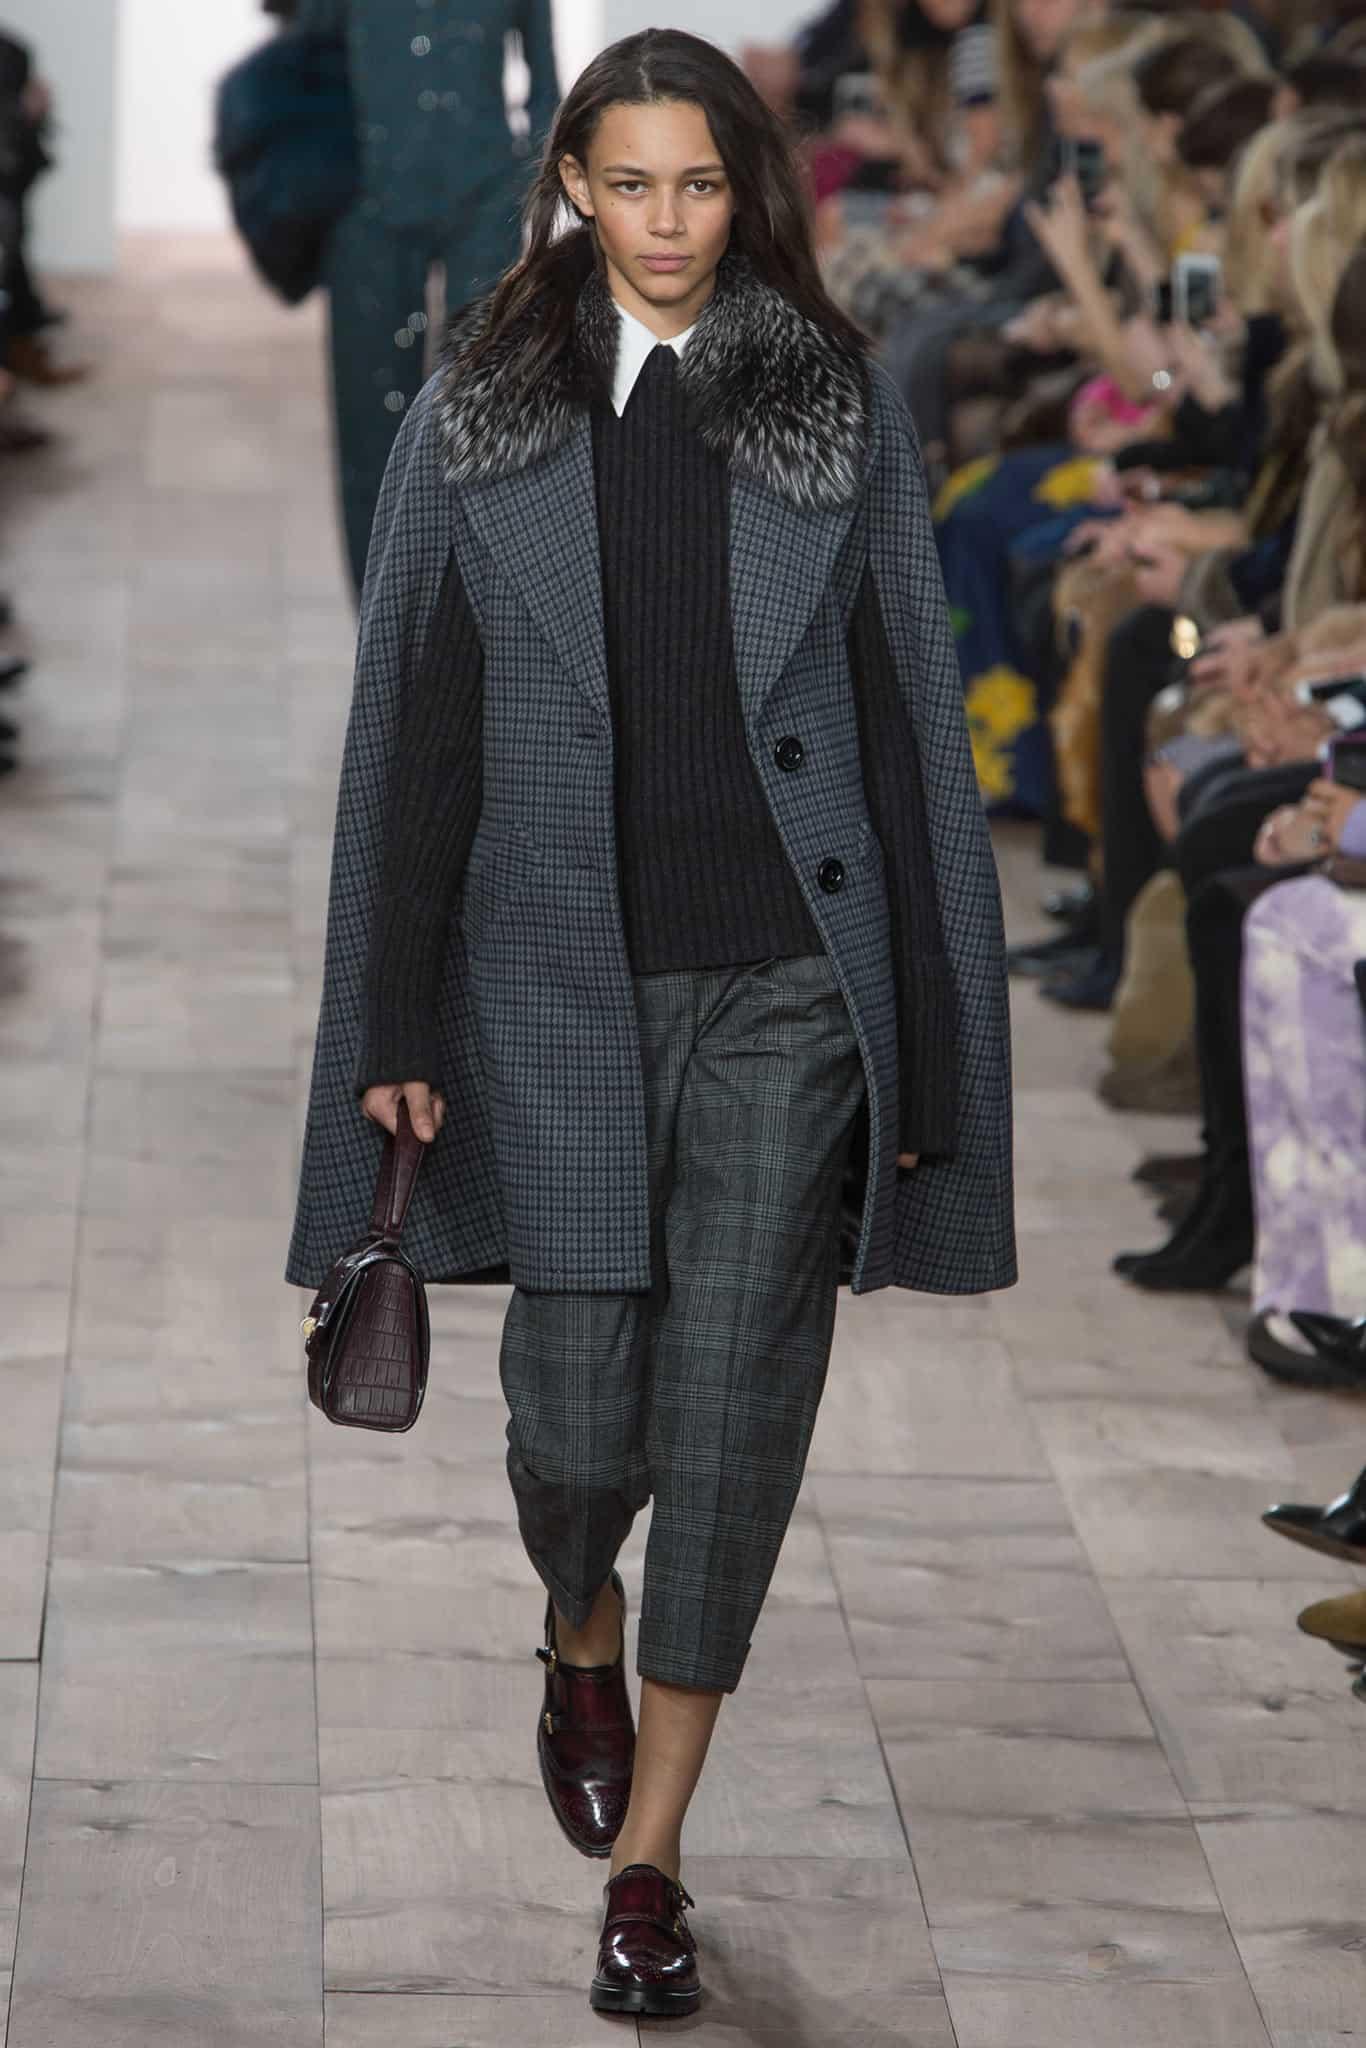 sfilata michael kors autunno inverno 2015 2016 5 motta fashion place rh mottafashionplace com